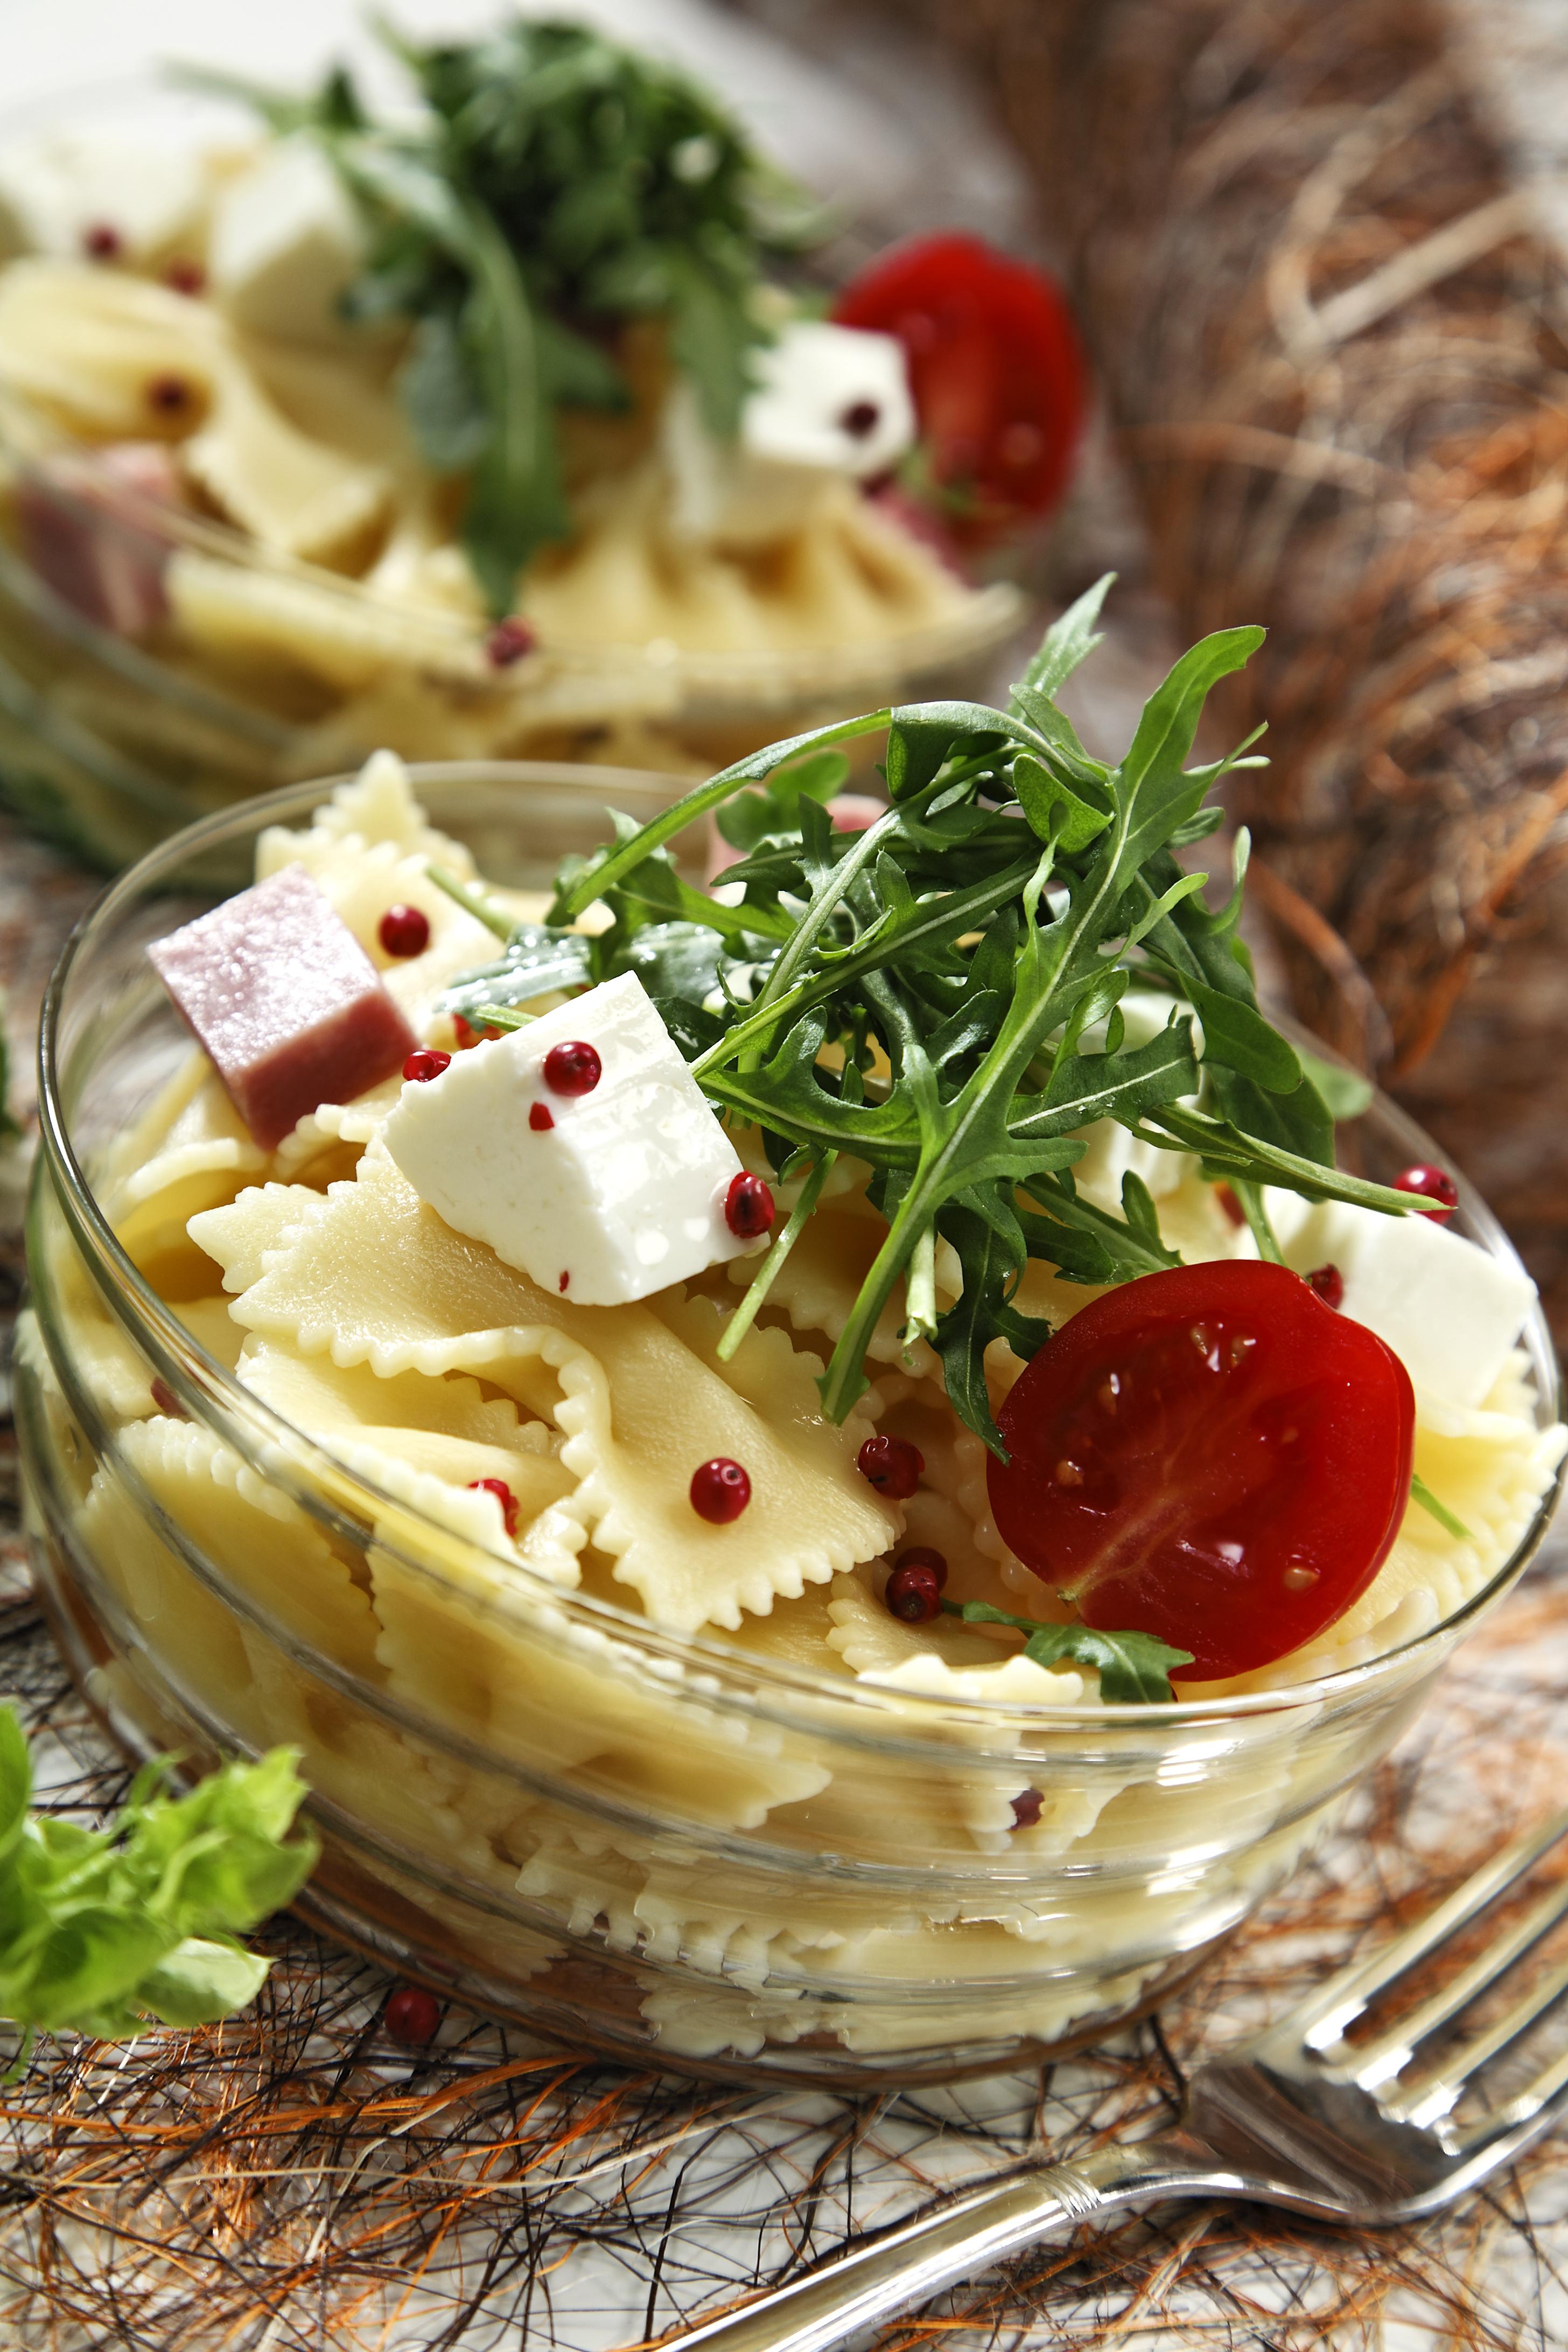 Ensalada ecológica de pasta con queso fresco, rúcula y tomates ecológicos